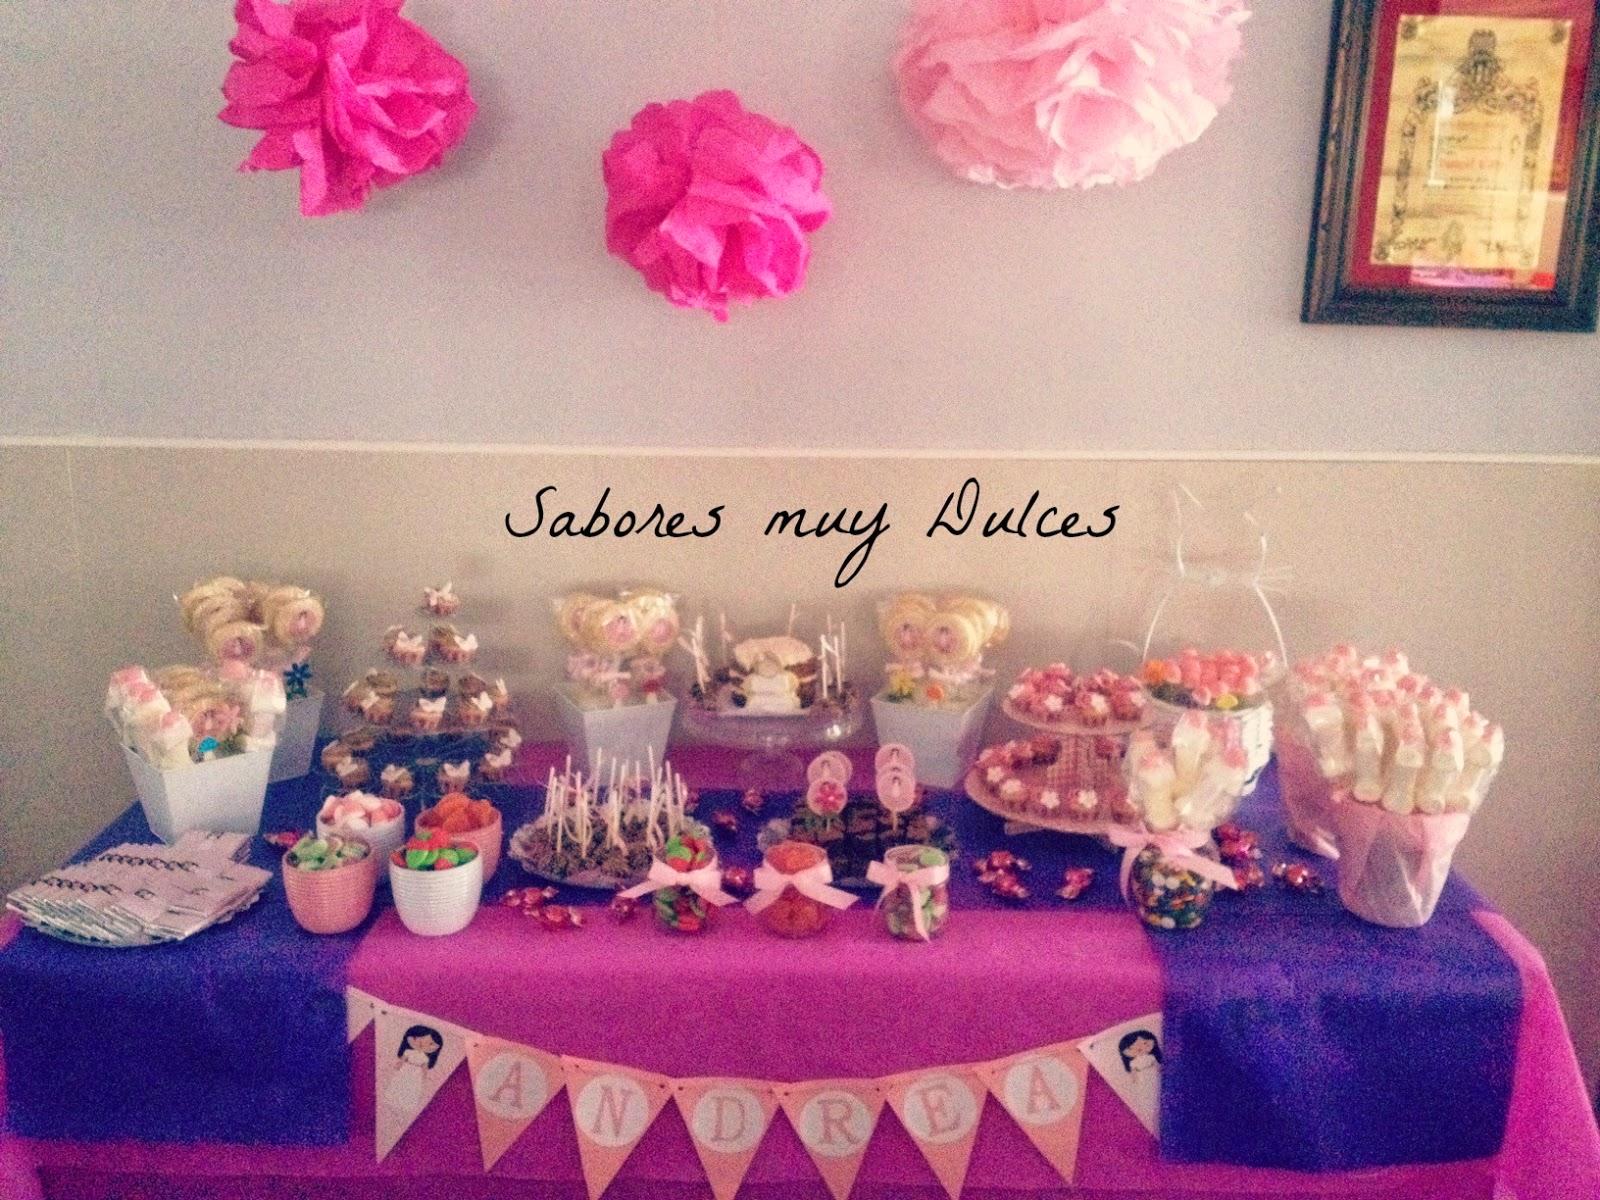 Sabores muy dulces mesa dulce y tarta de comuni n para andrea for Mesas dulces comunion nina